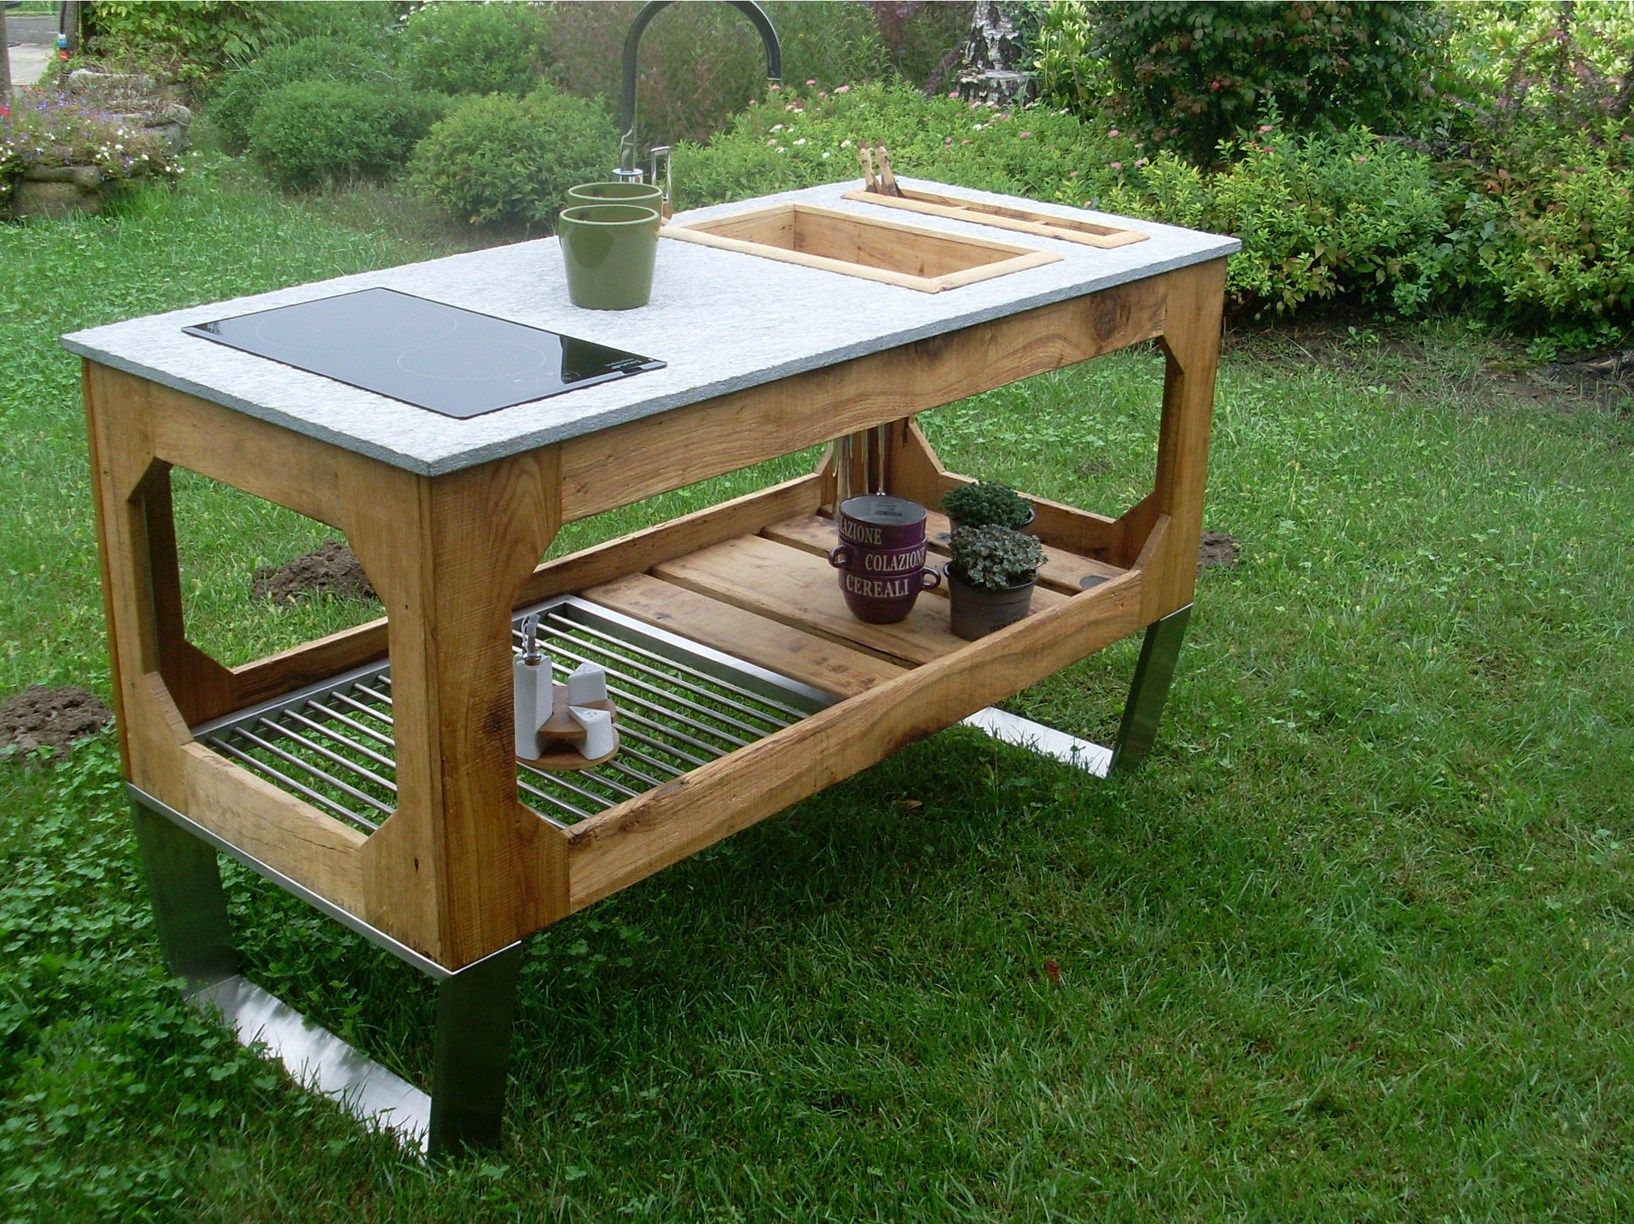 Lgtek outdoor arricchisce la gamma di cucine da esterno window - Cucina da giardino ...